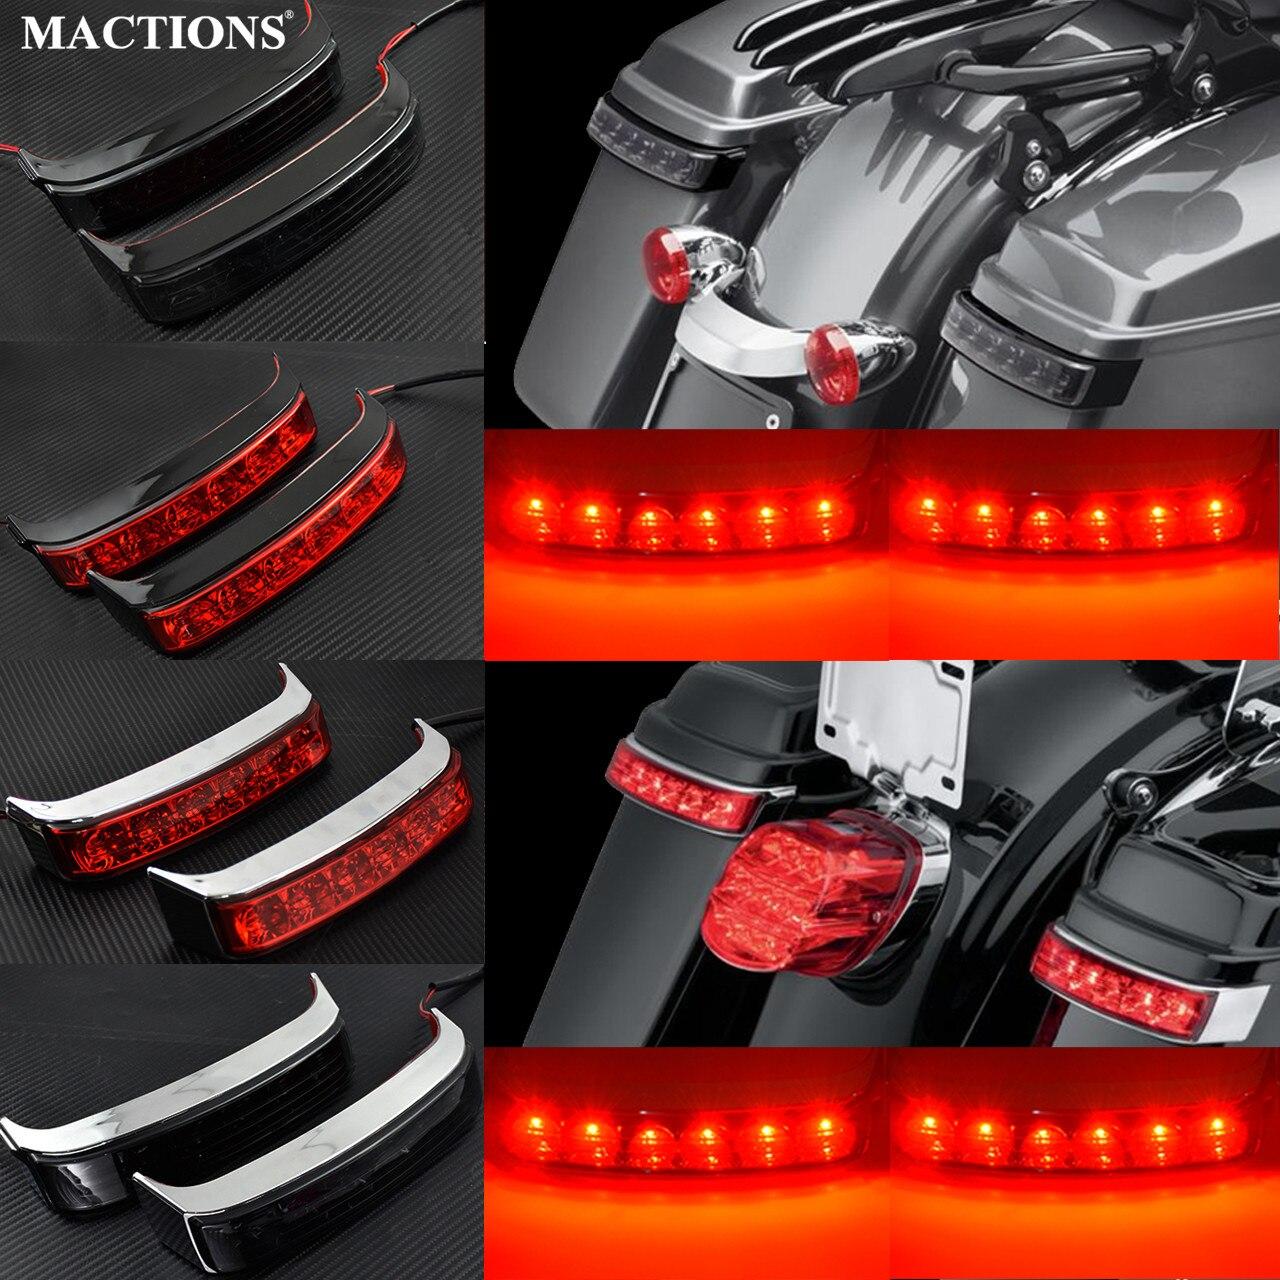 Saddle Bag Luggage Tail Turn Signal Light Running Lamp For Harley Touring Road King FLHR 2014-2018 CVO Limited FLHTKSE 2014